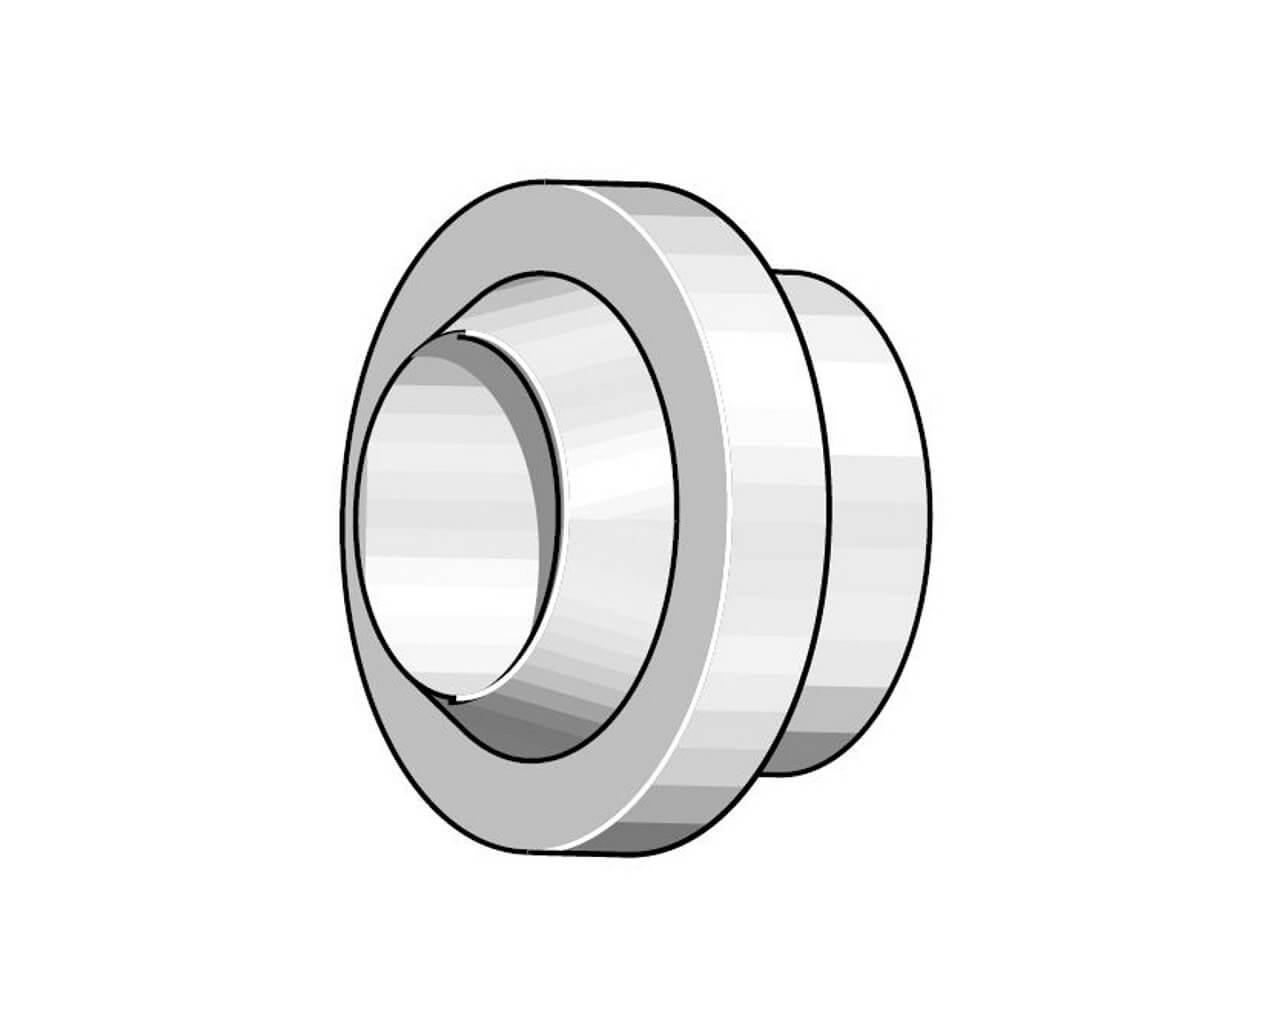 Isolator 17/18/26 GL 54N01 für Gaslinse